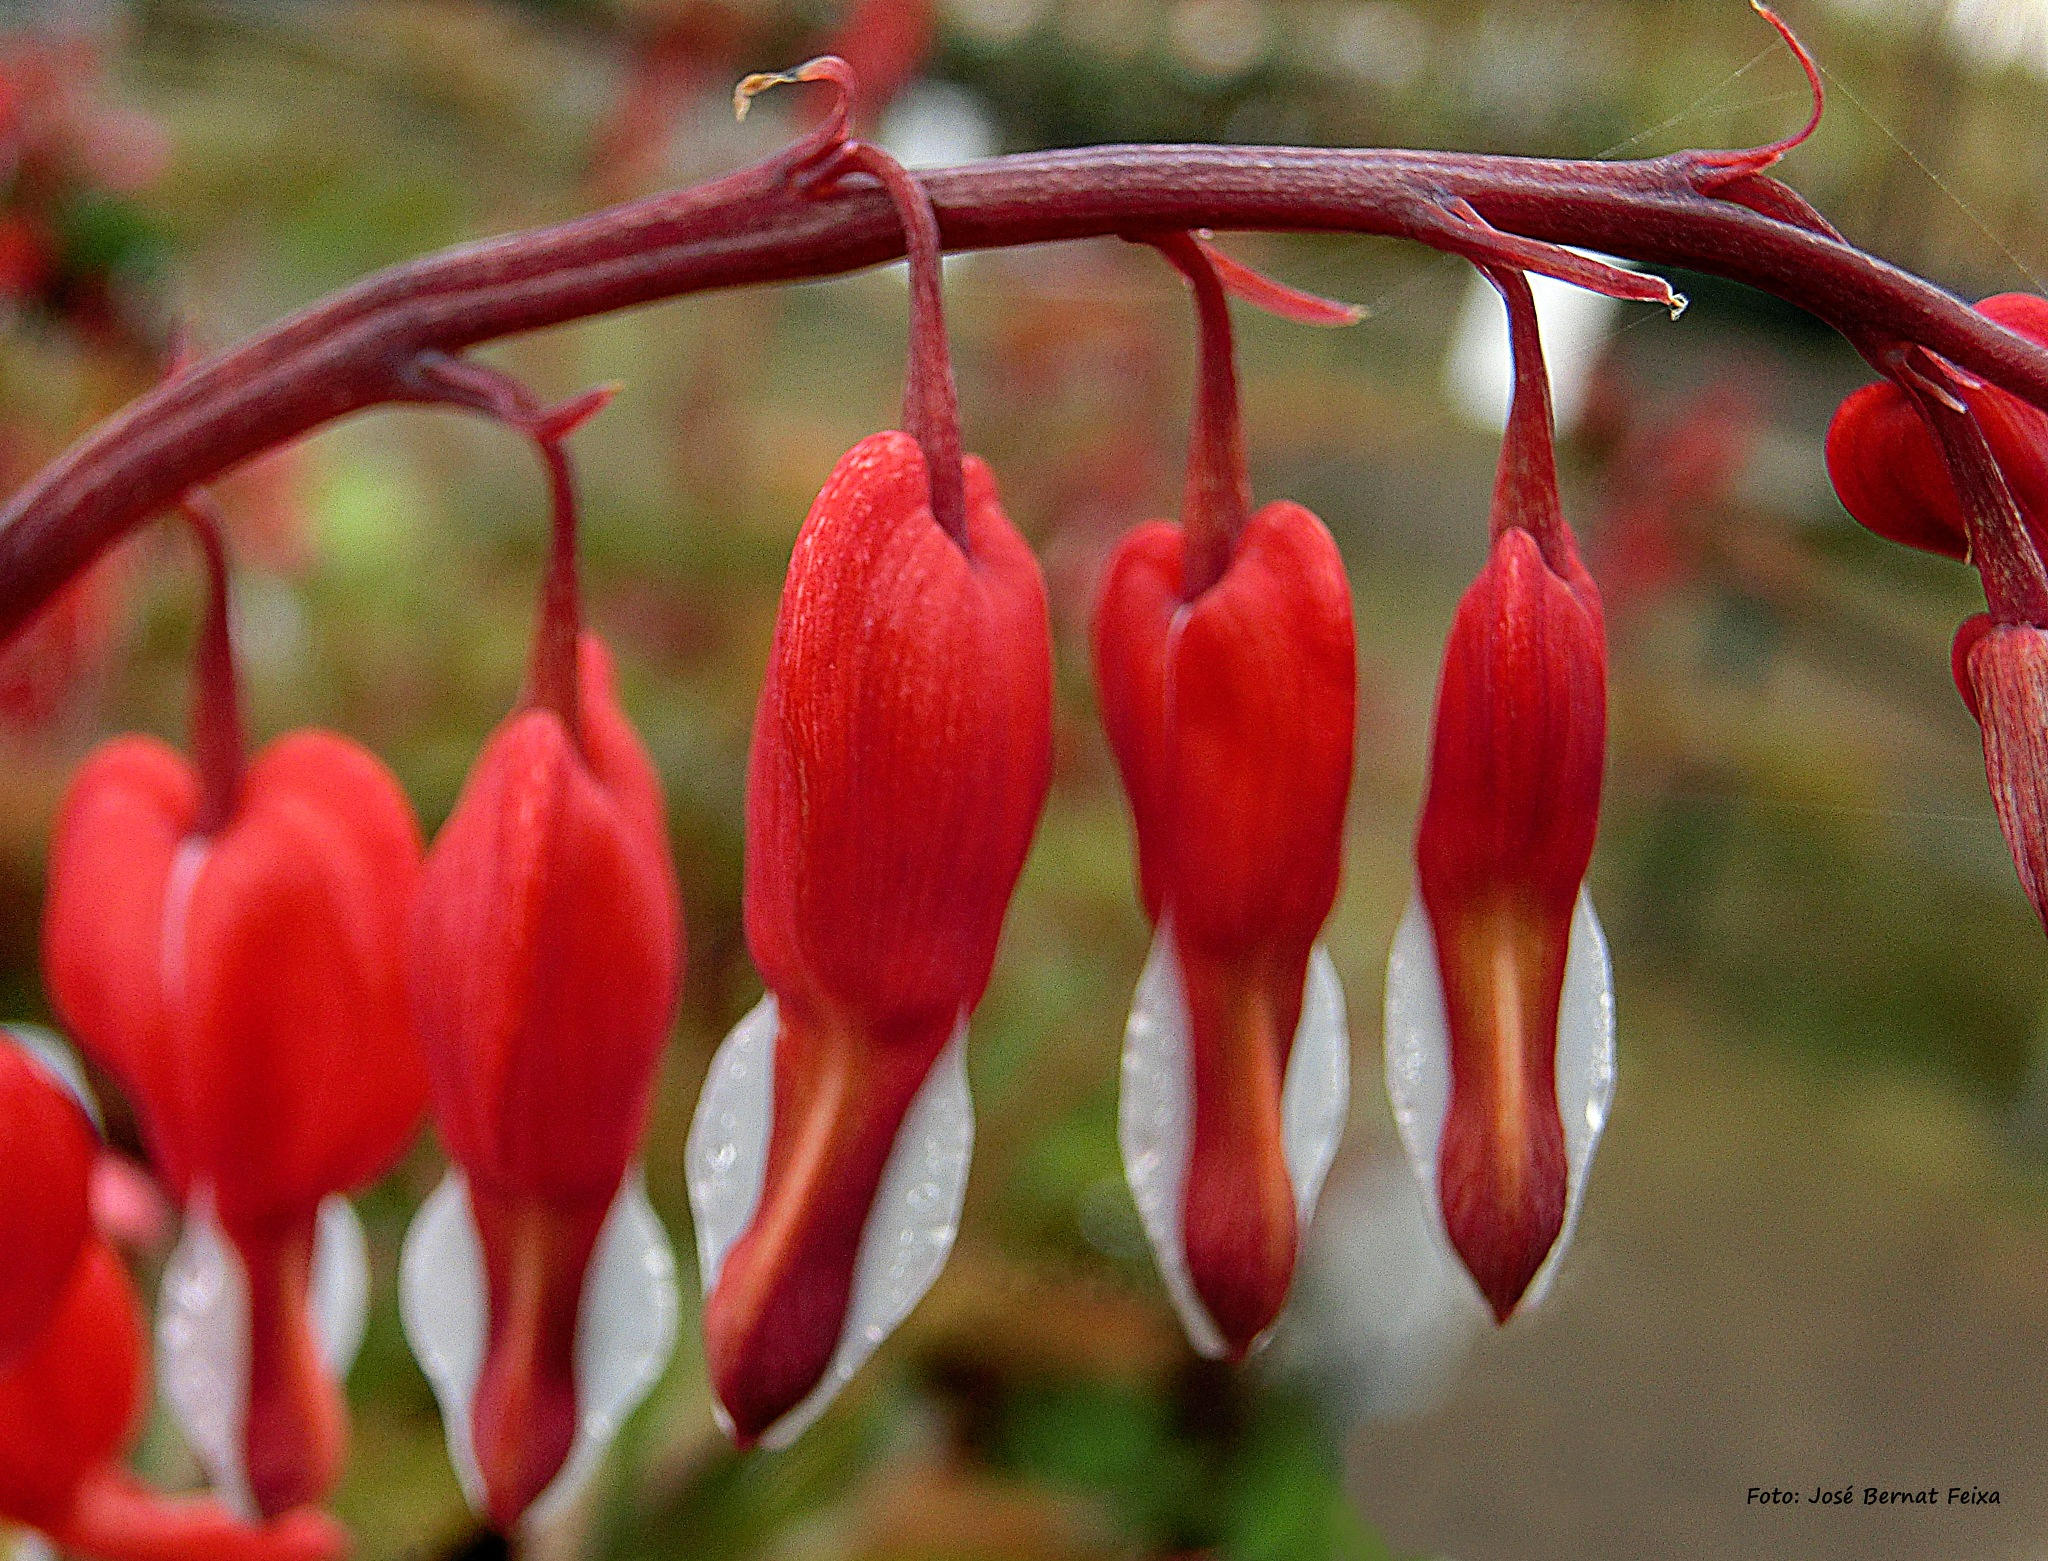 FLORES PRIMAVERALES; LENTEBLOEMEN; SPRING FLOWERS -Macro- by José Bernat Feixa